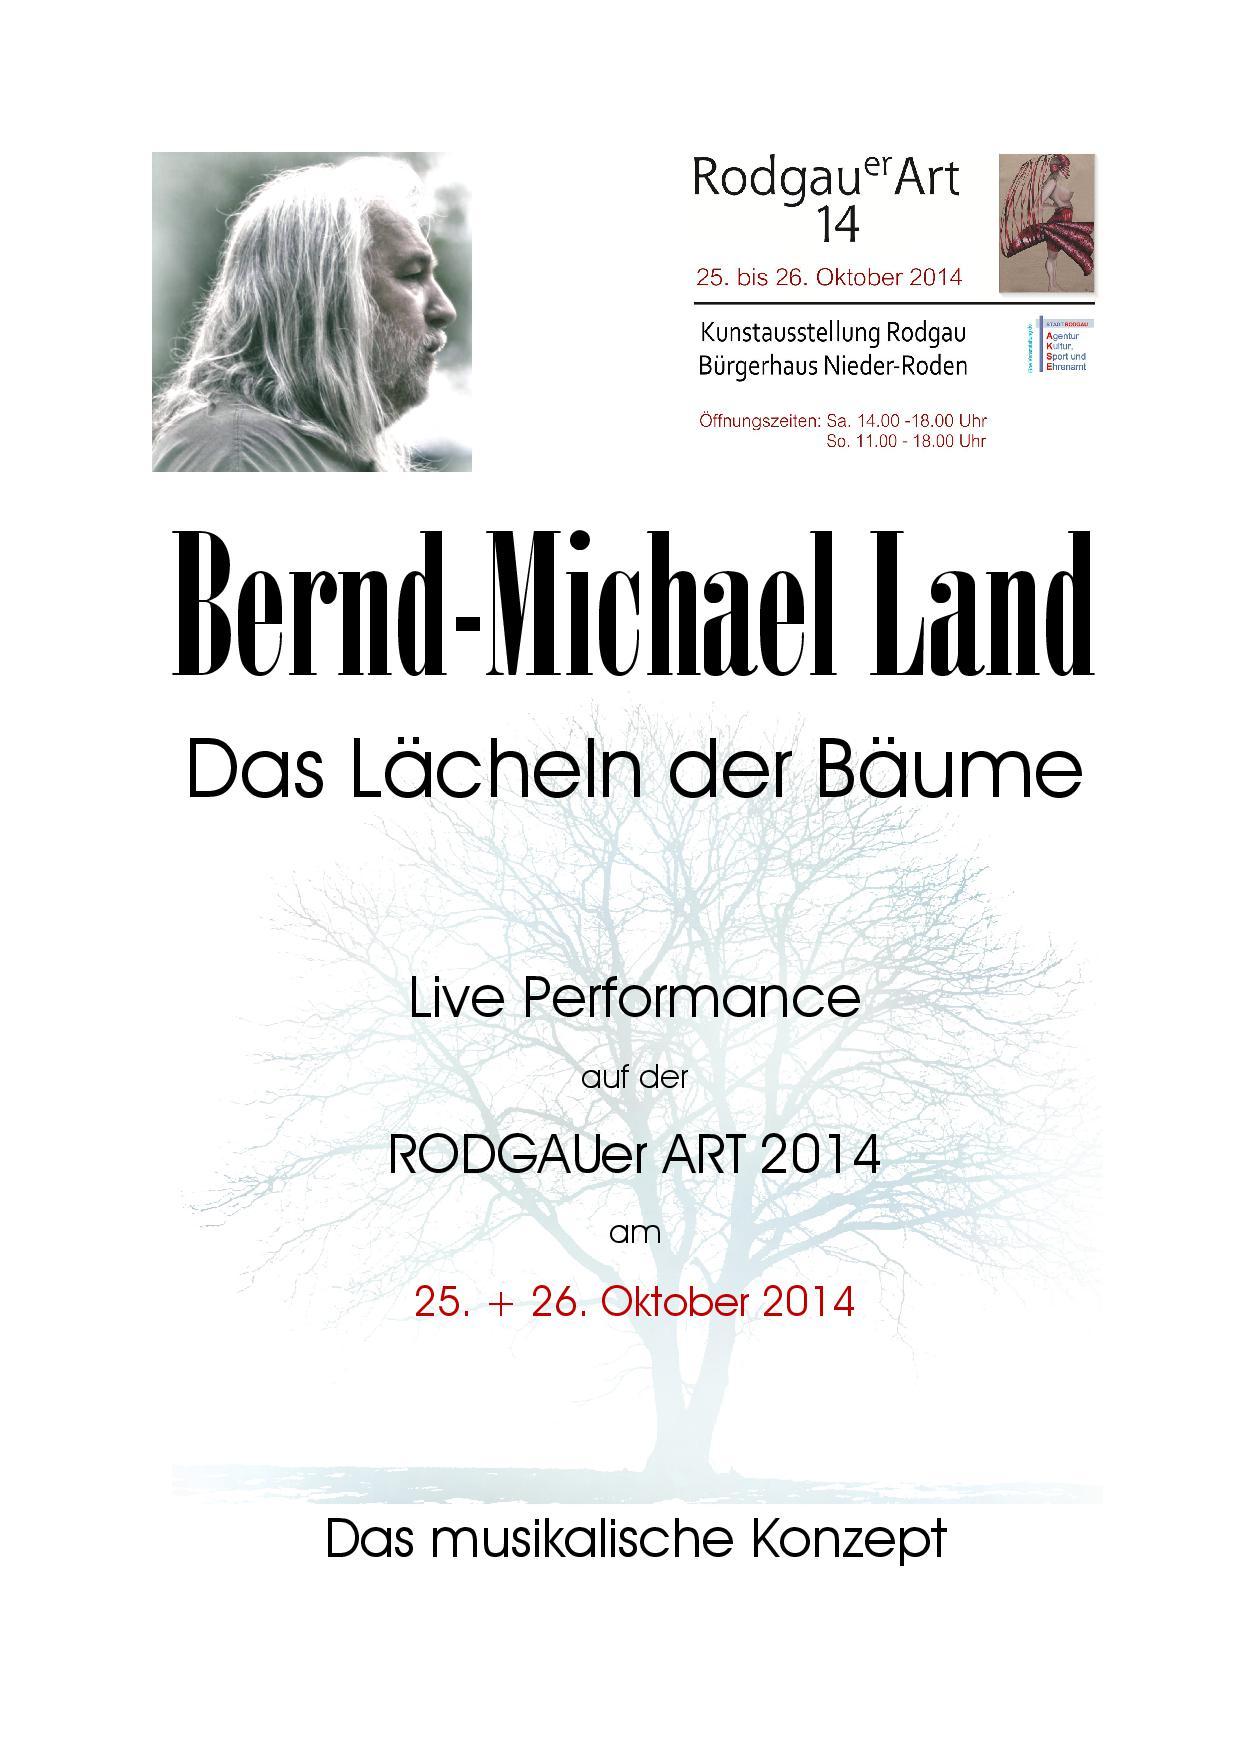 Bernd-Michael-Land-Vitae+more-001